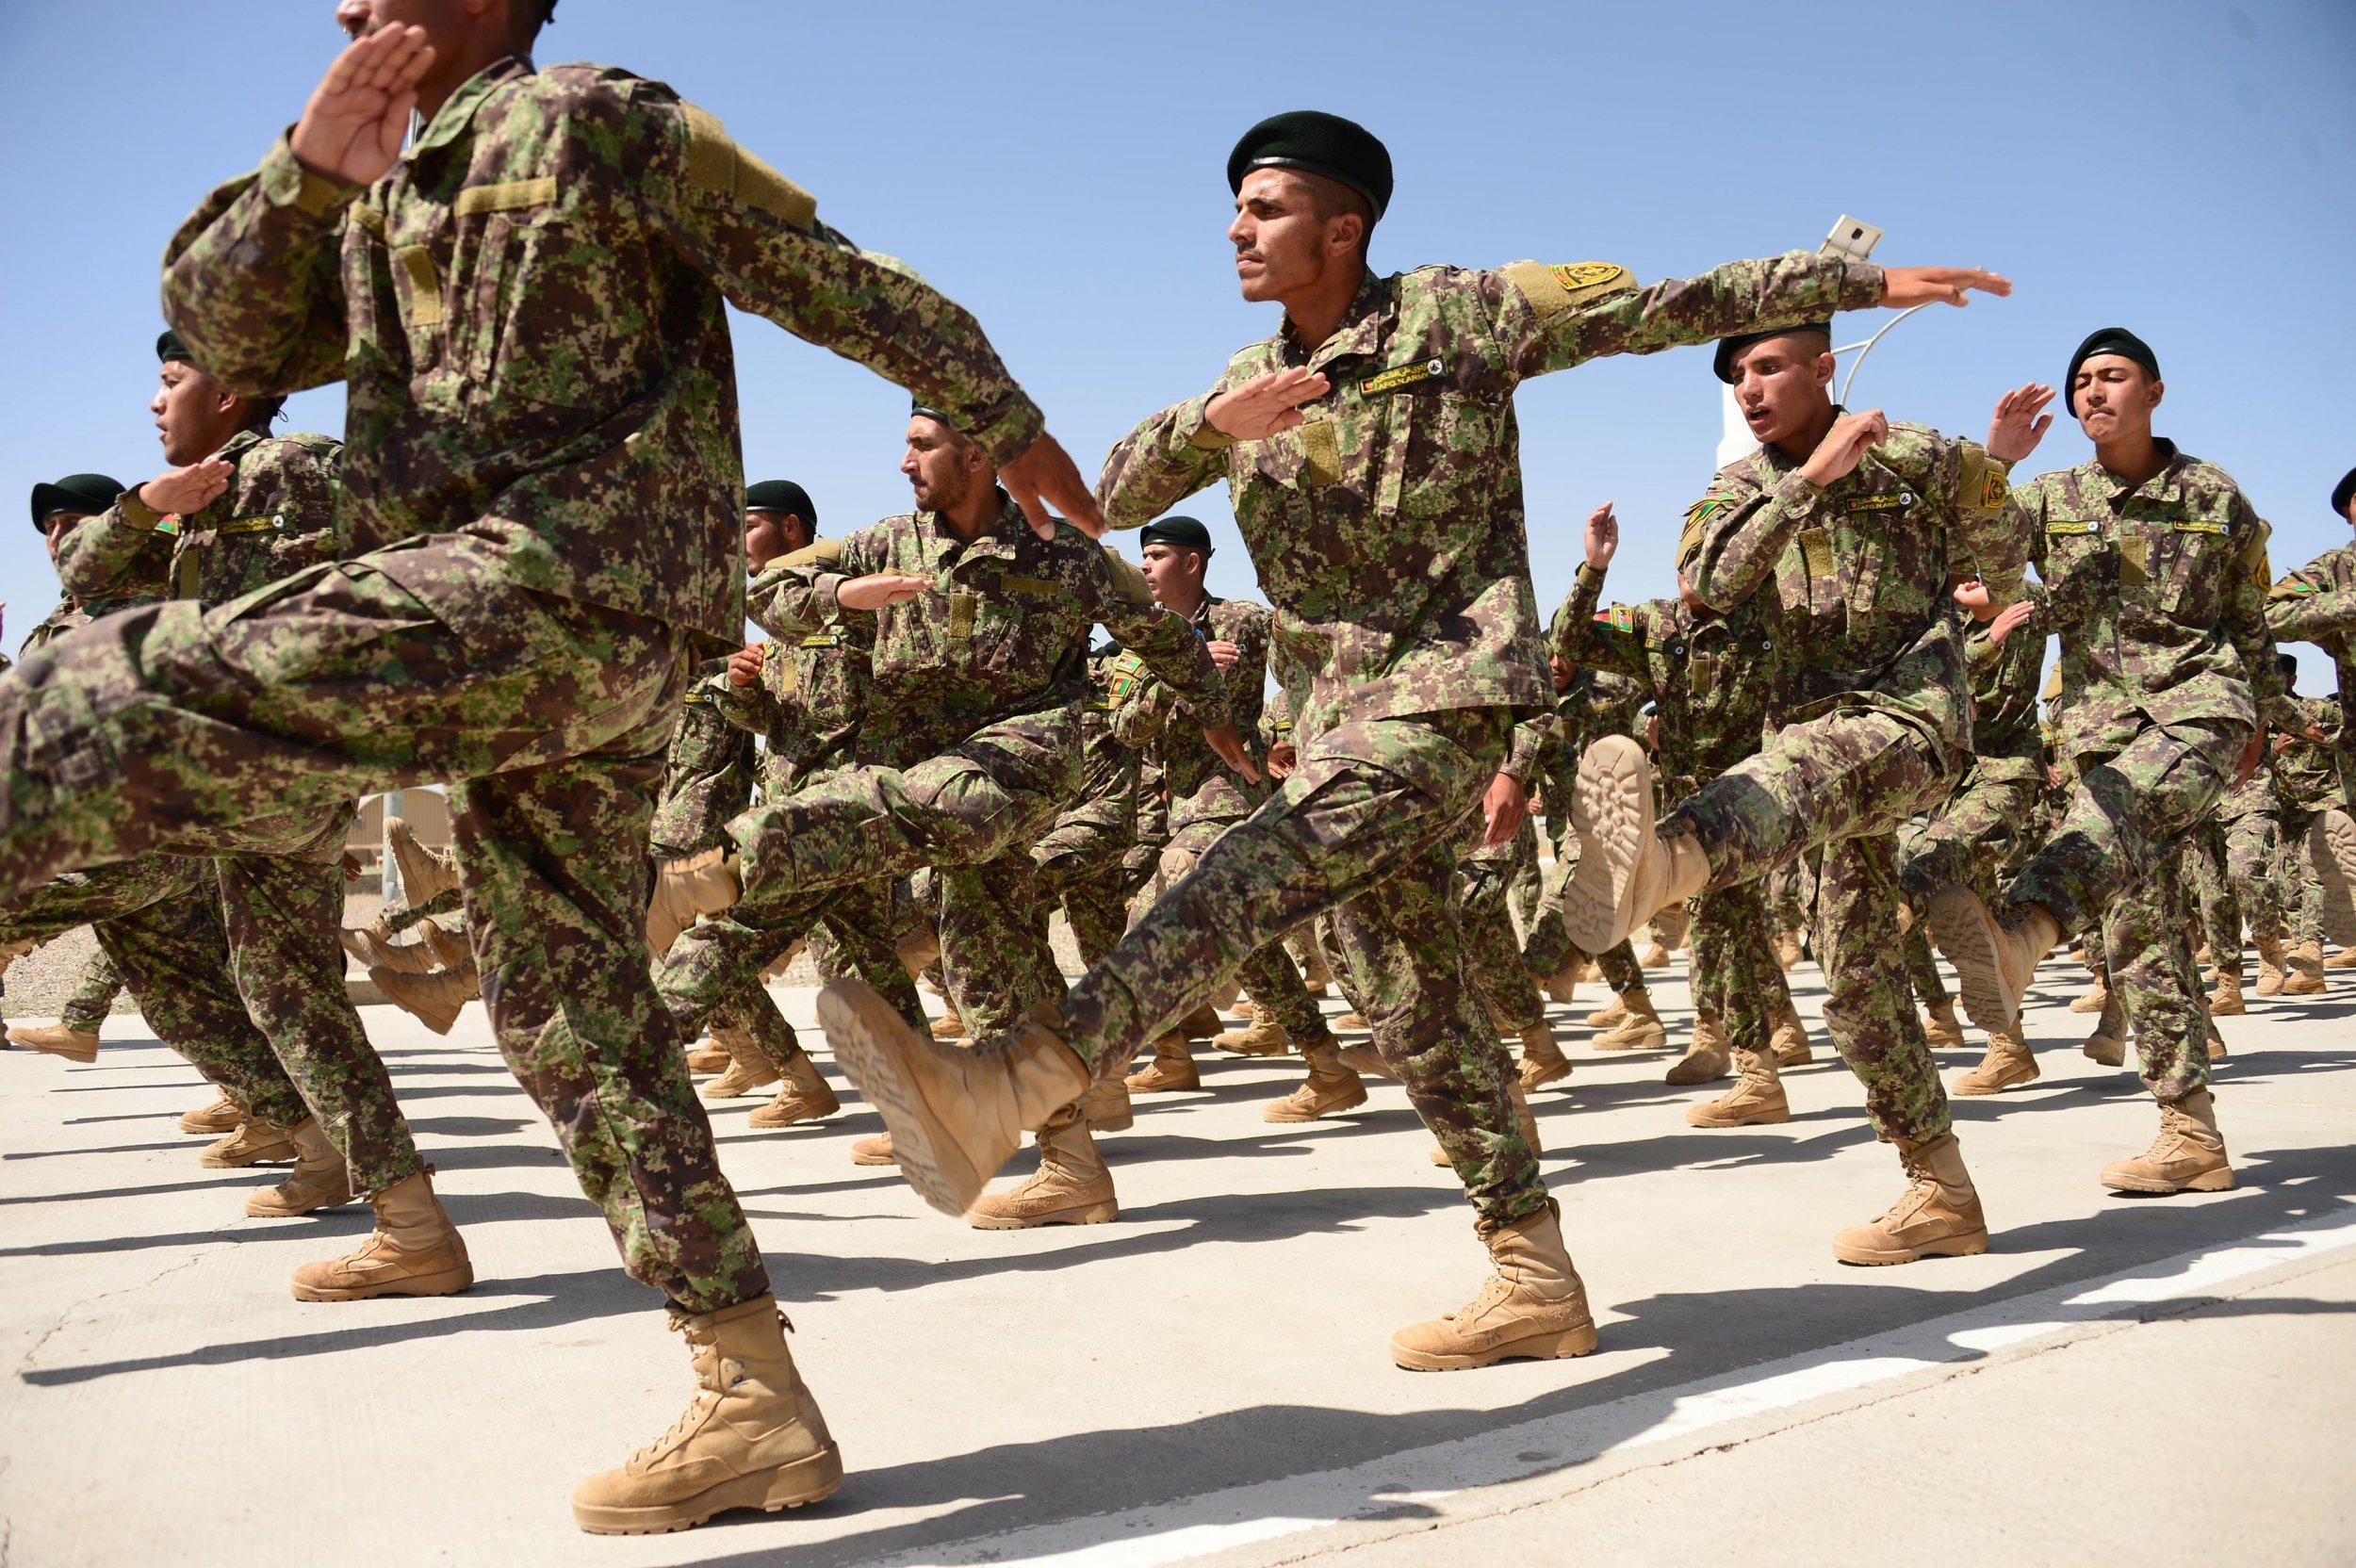 Afghan training